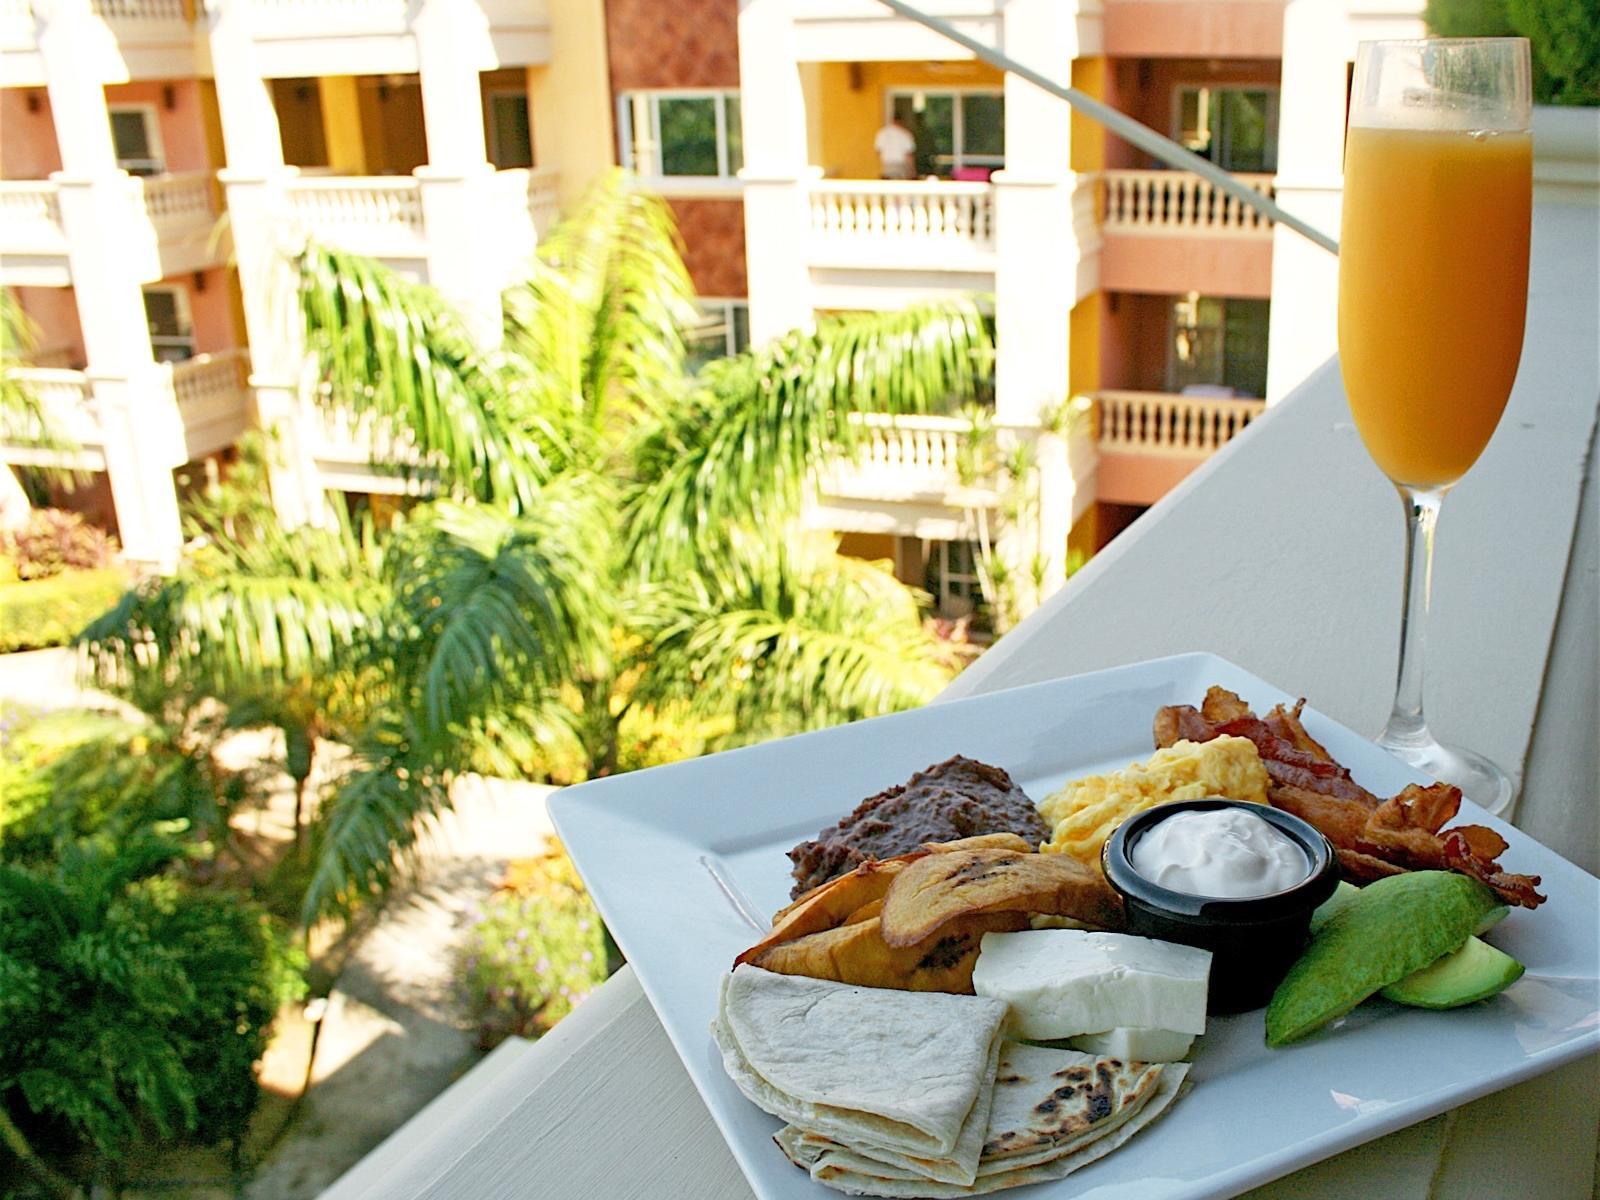 plate of food on ledge of balcony